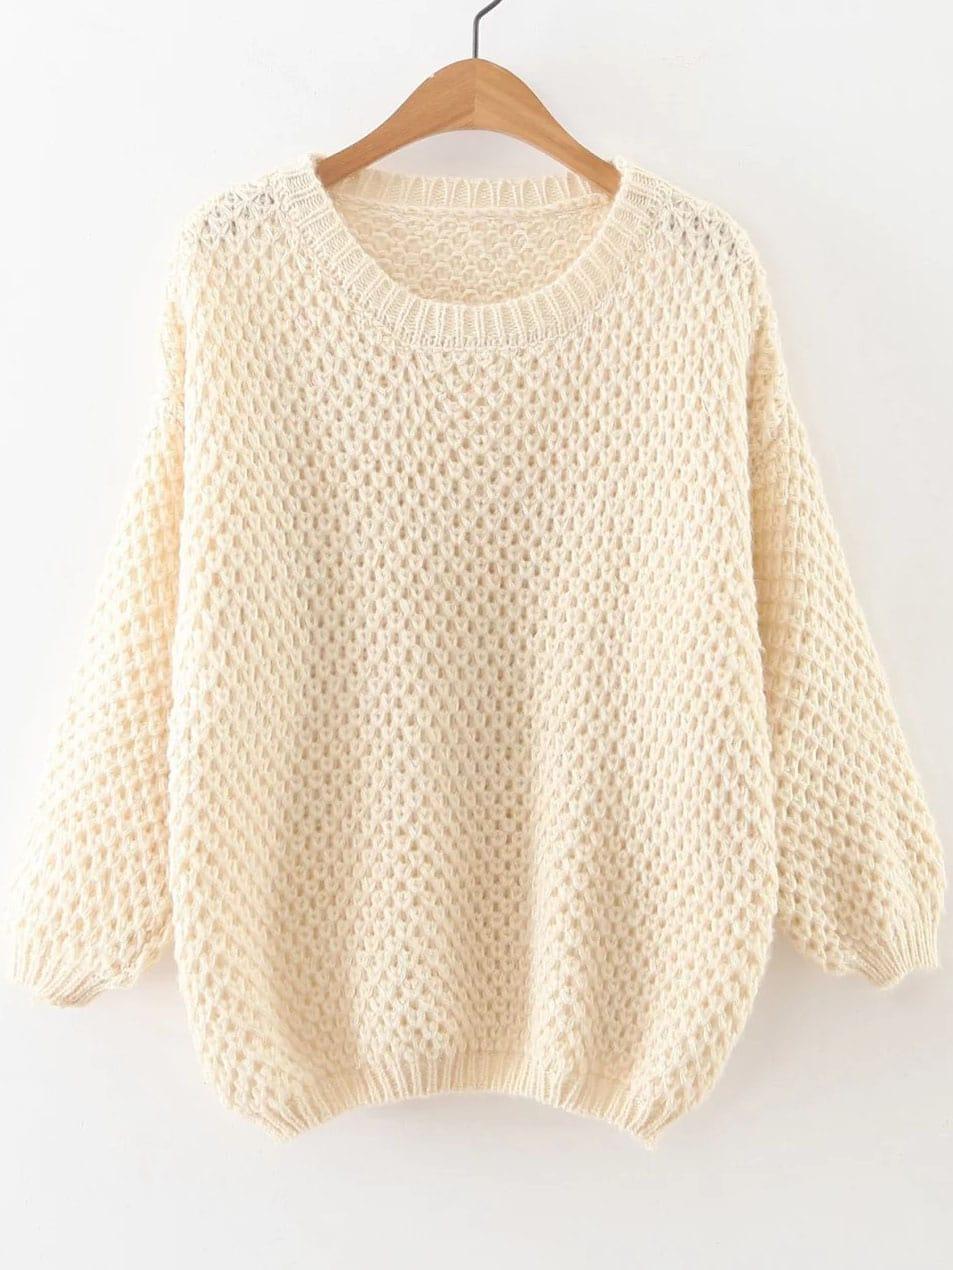 sweater160920233_2